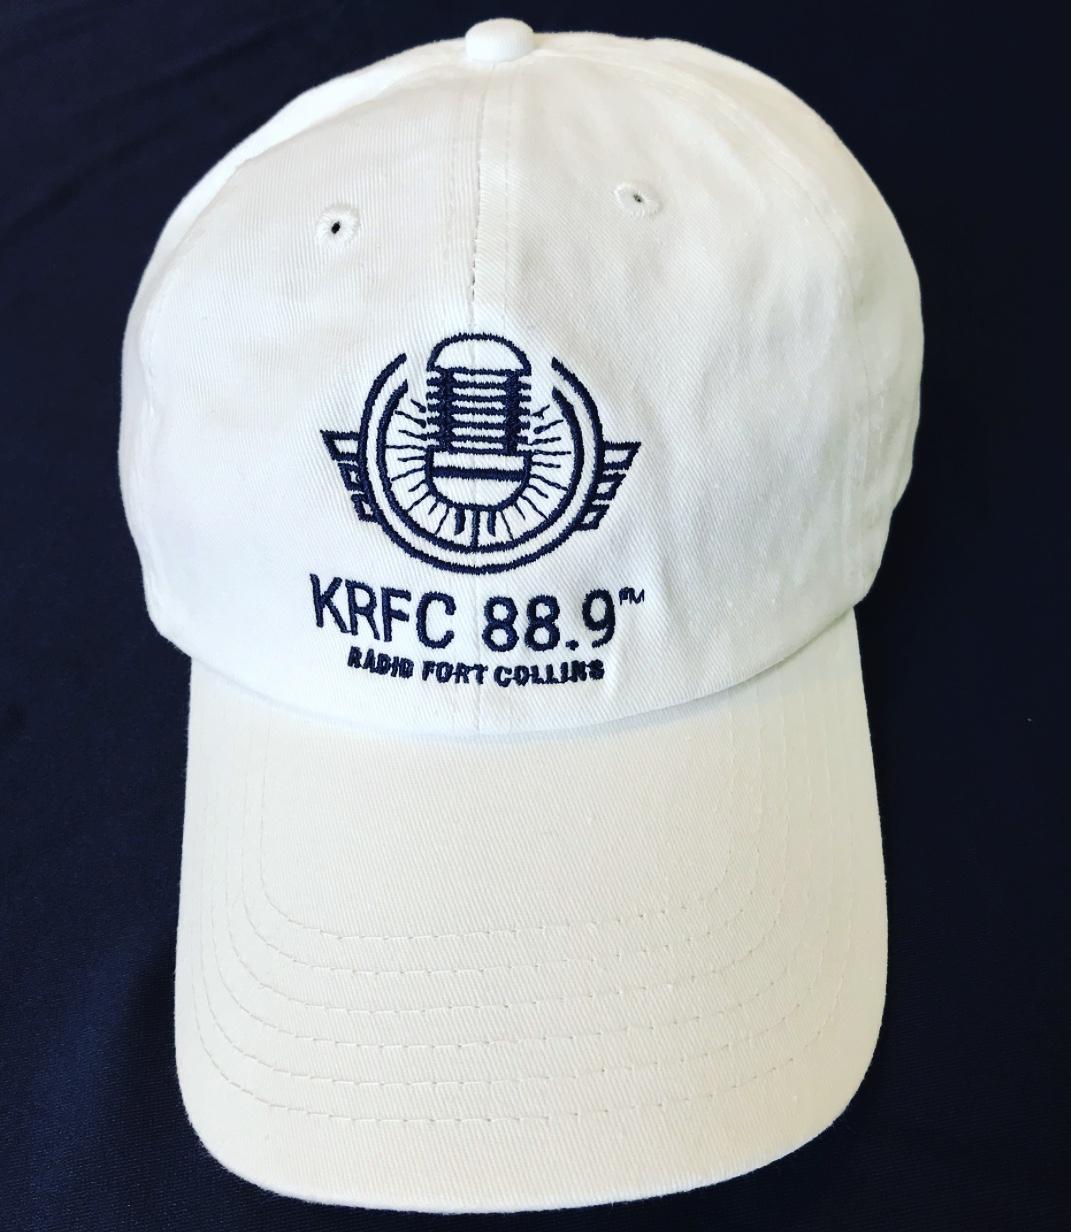 KRFC 88.9 FM Baseball Cap